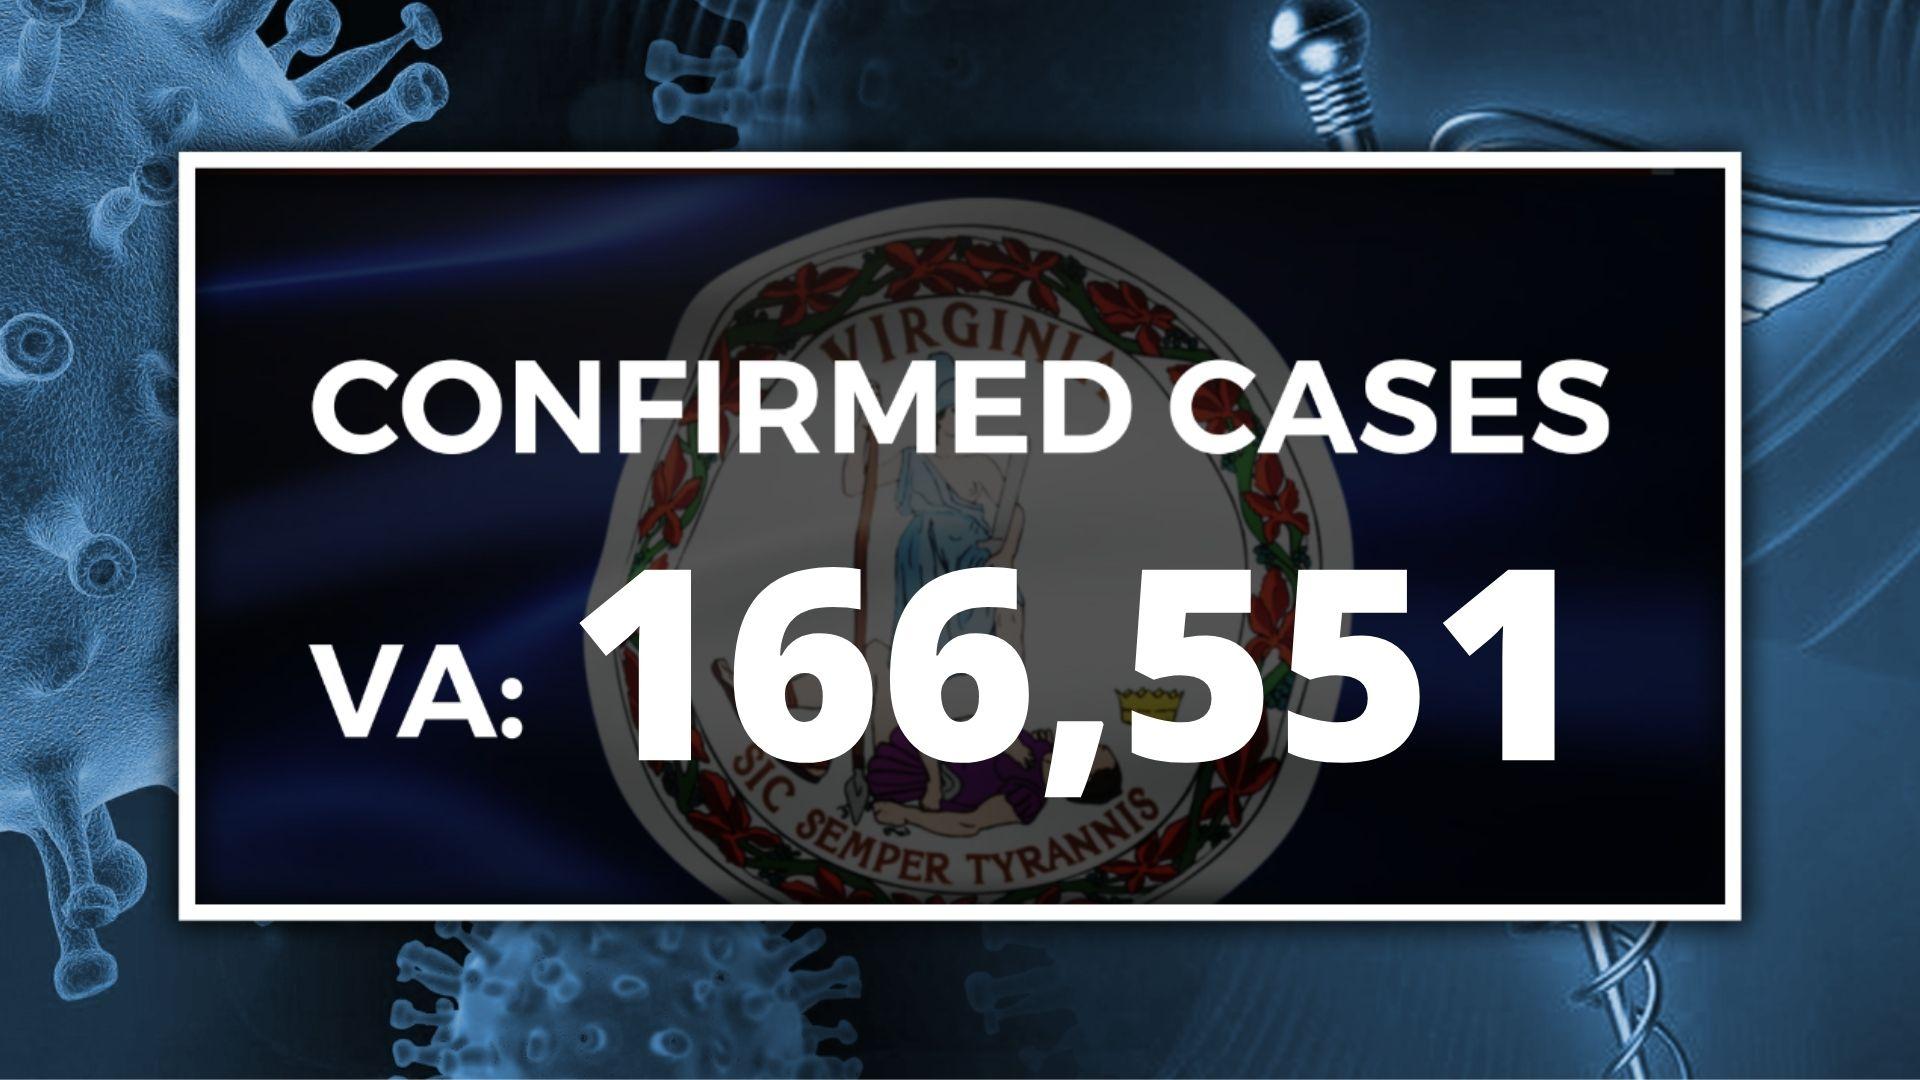 Buchanan Va Christmas Parade 2020 VDH: New COVID 19 death reported in Buchanan County, 107 new cases